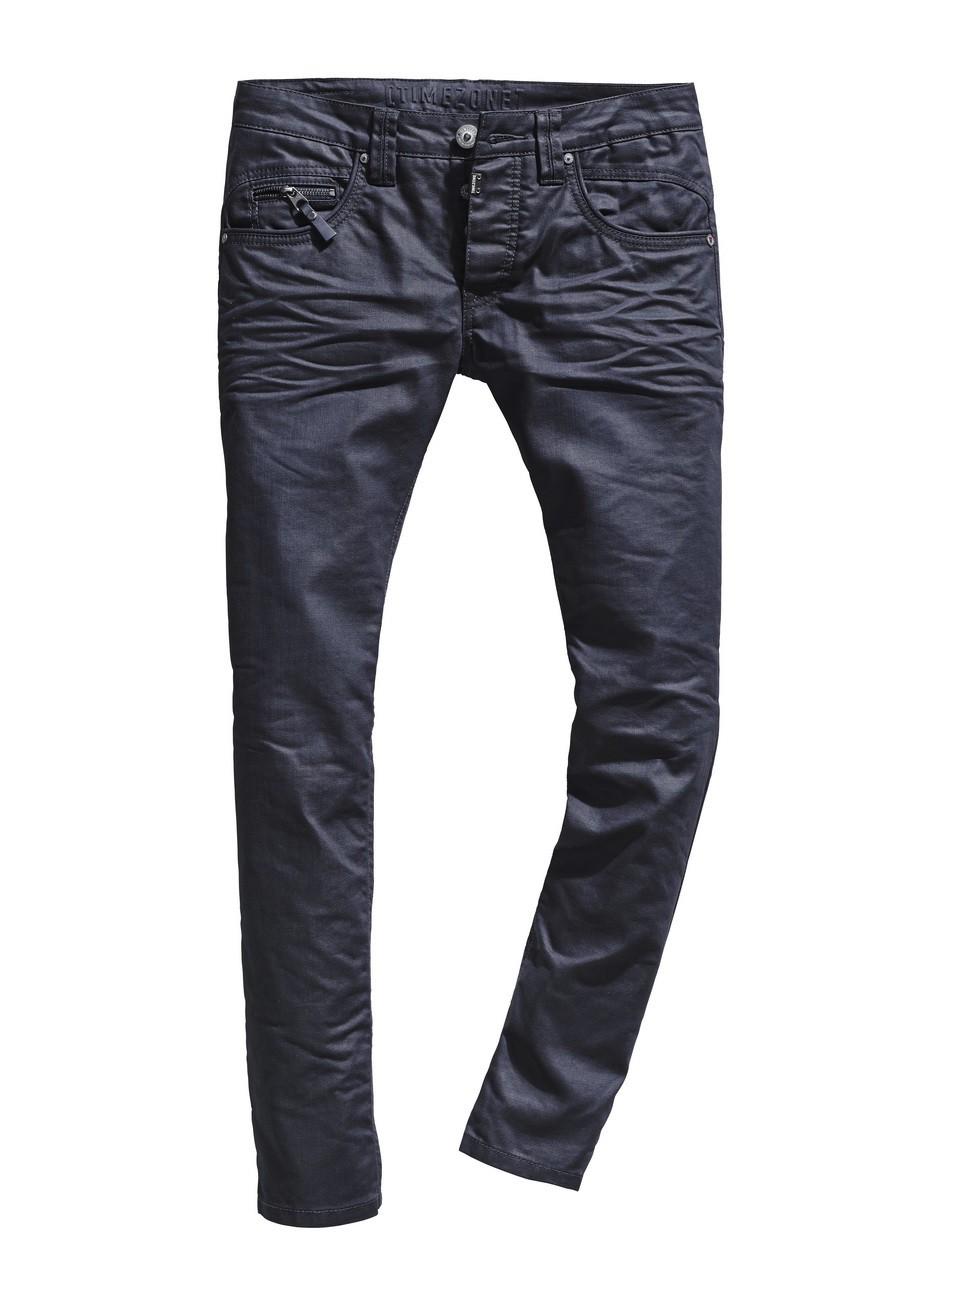 timezone herren jeans taylortz 26 5589 3301 3452 slim fit. Black Bedroom Furniture Sets. Home Design Ideas